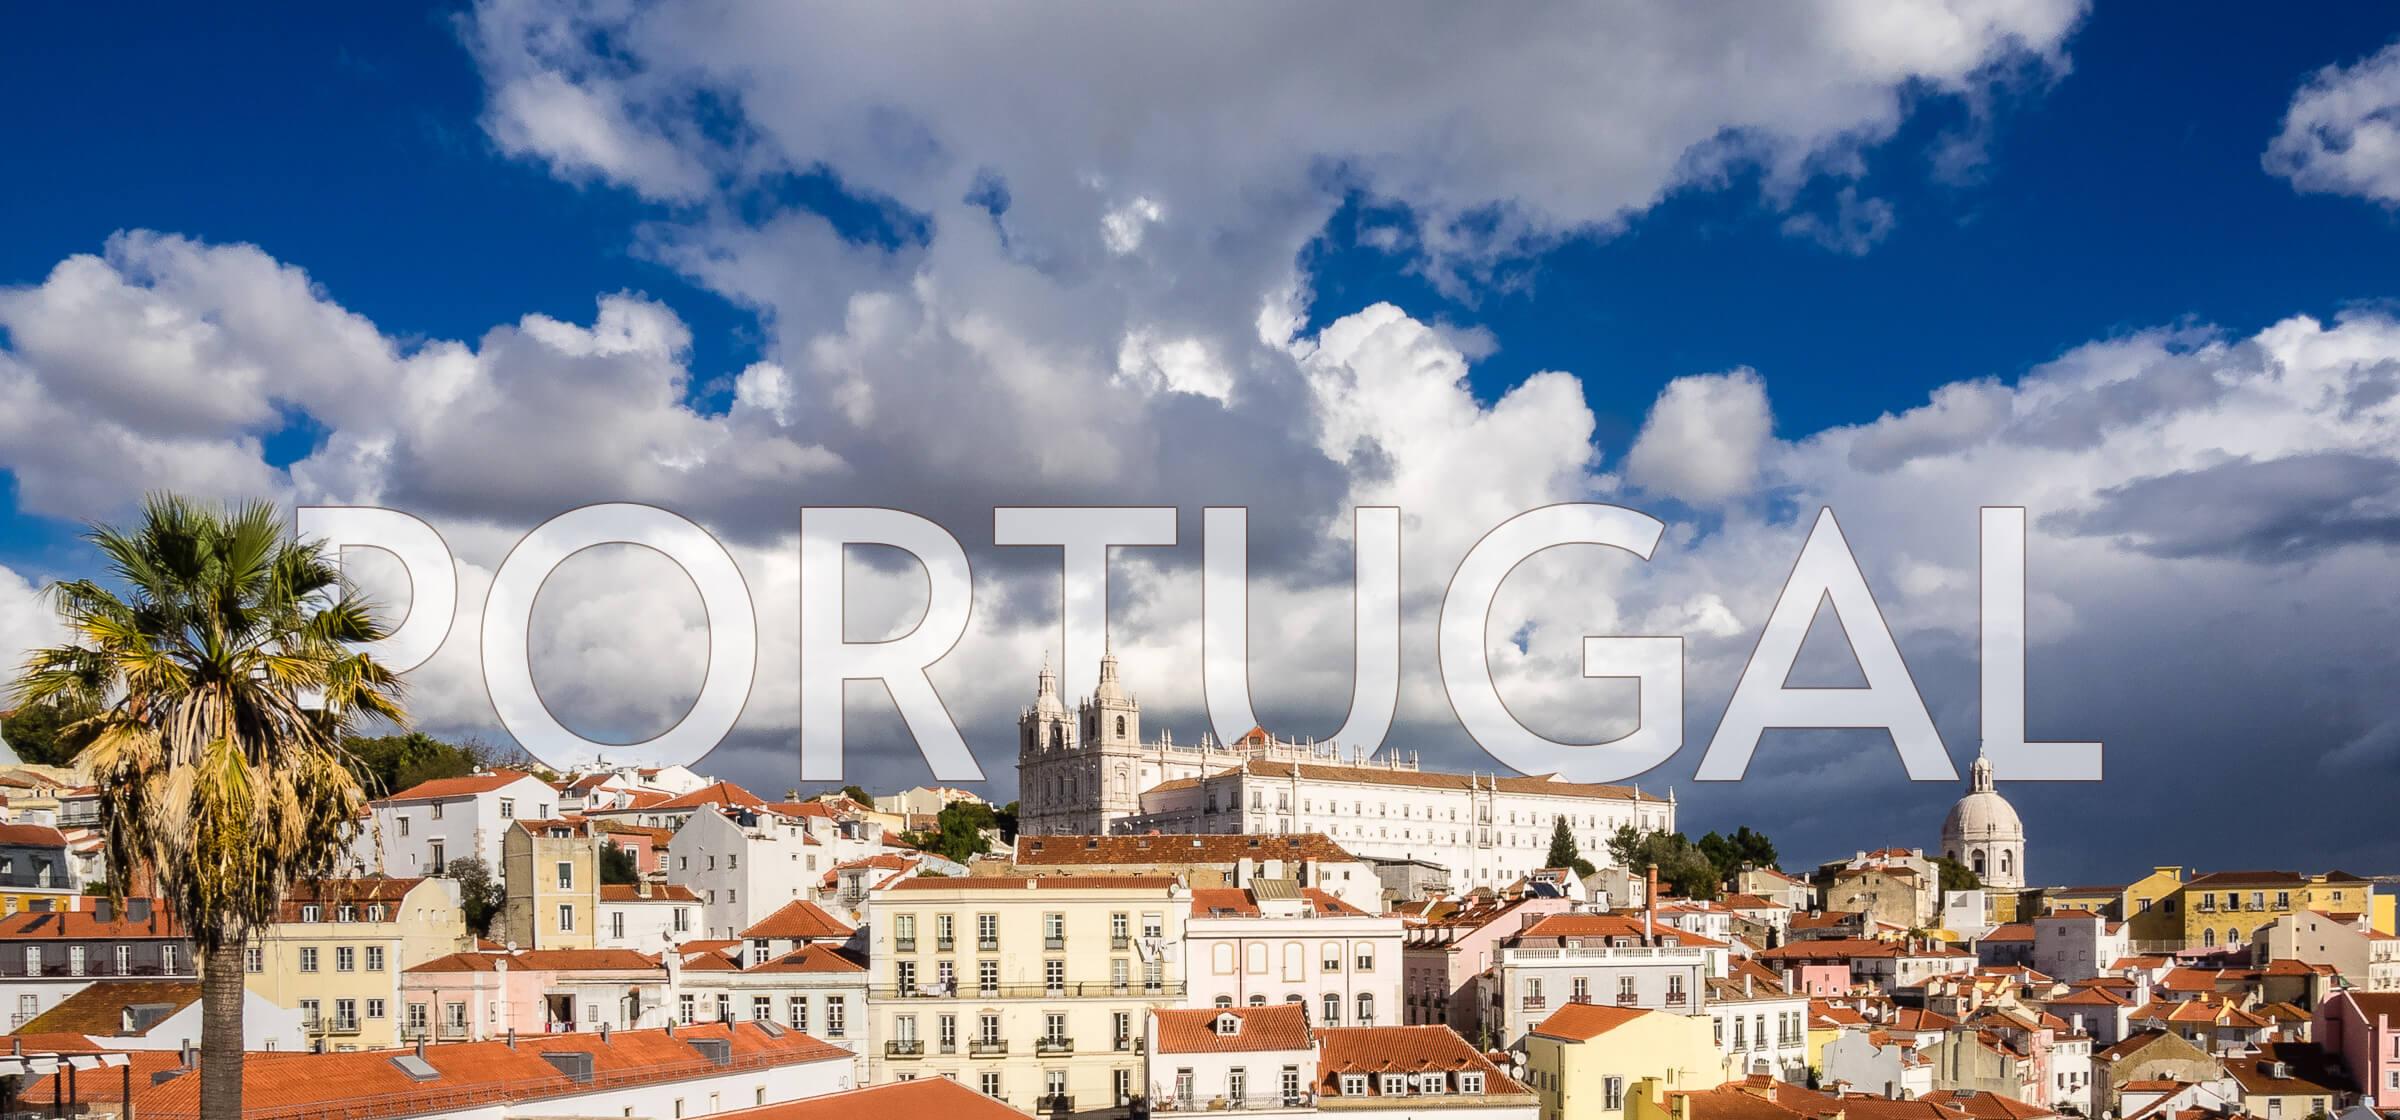 the neighbourhood of Alfama, in Lisbon, Portugal